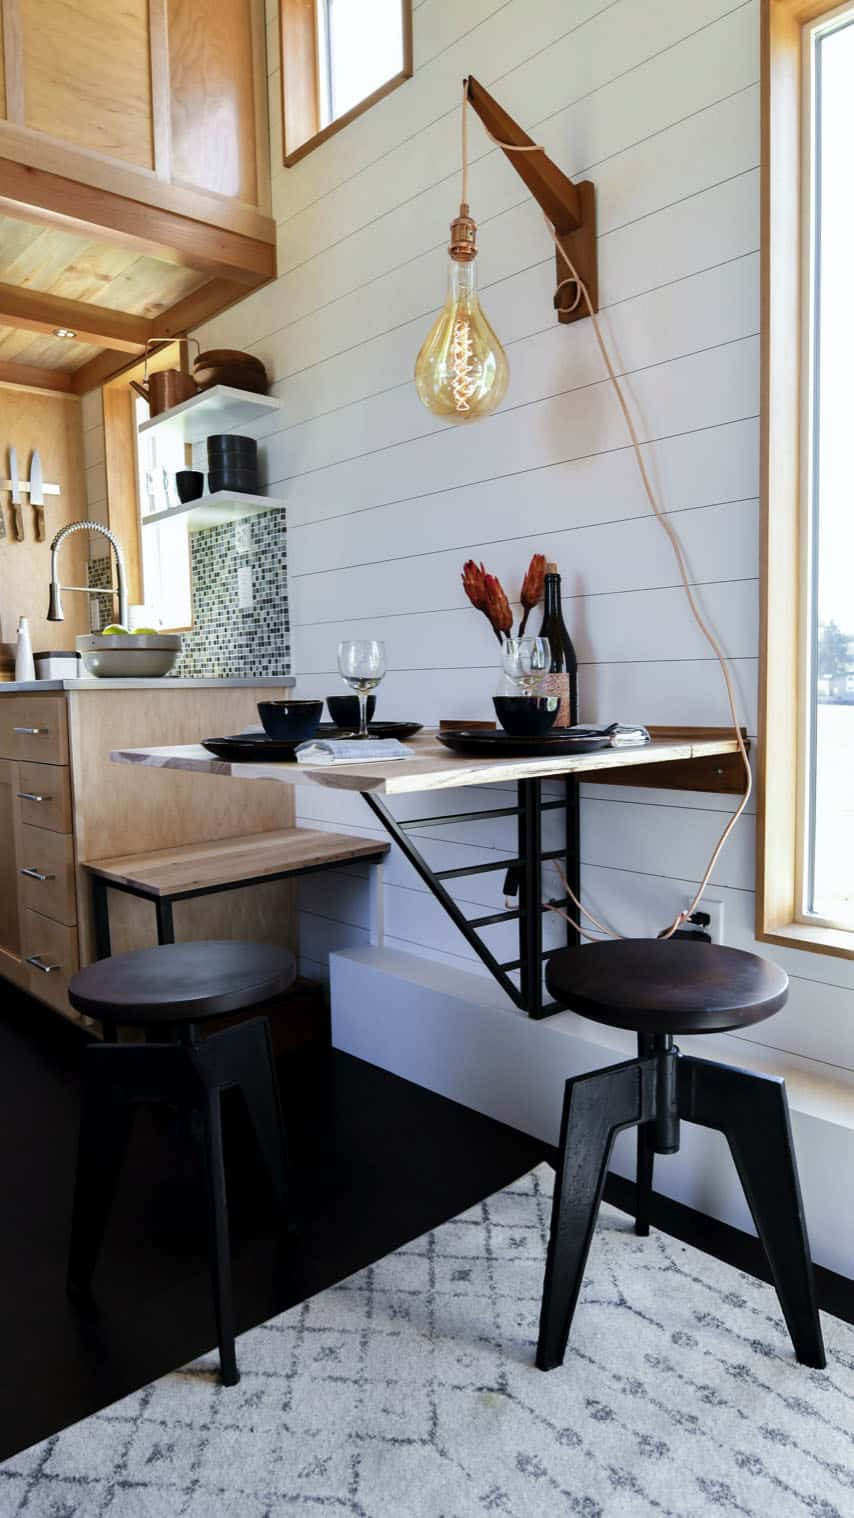 off-grid-tiny-home-farmhouse-dining-room